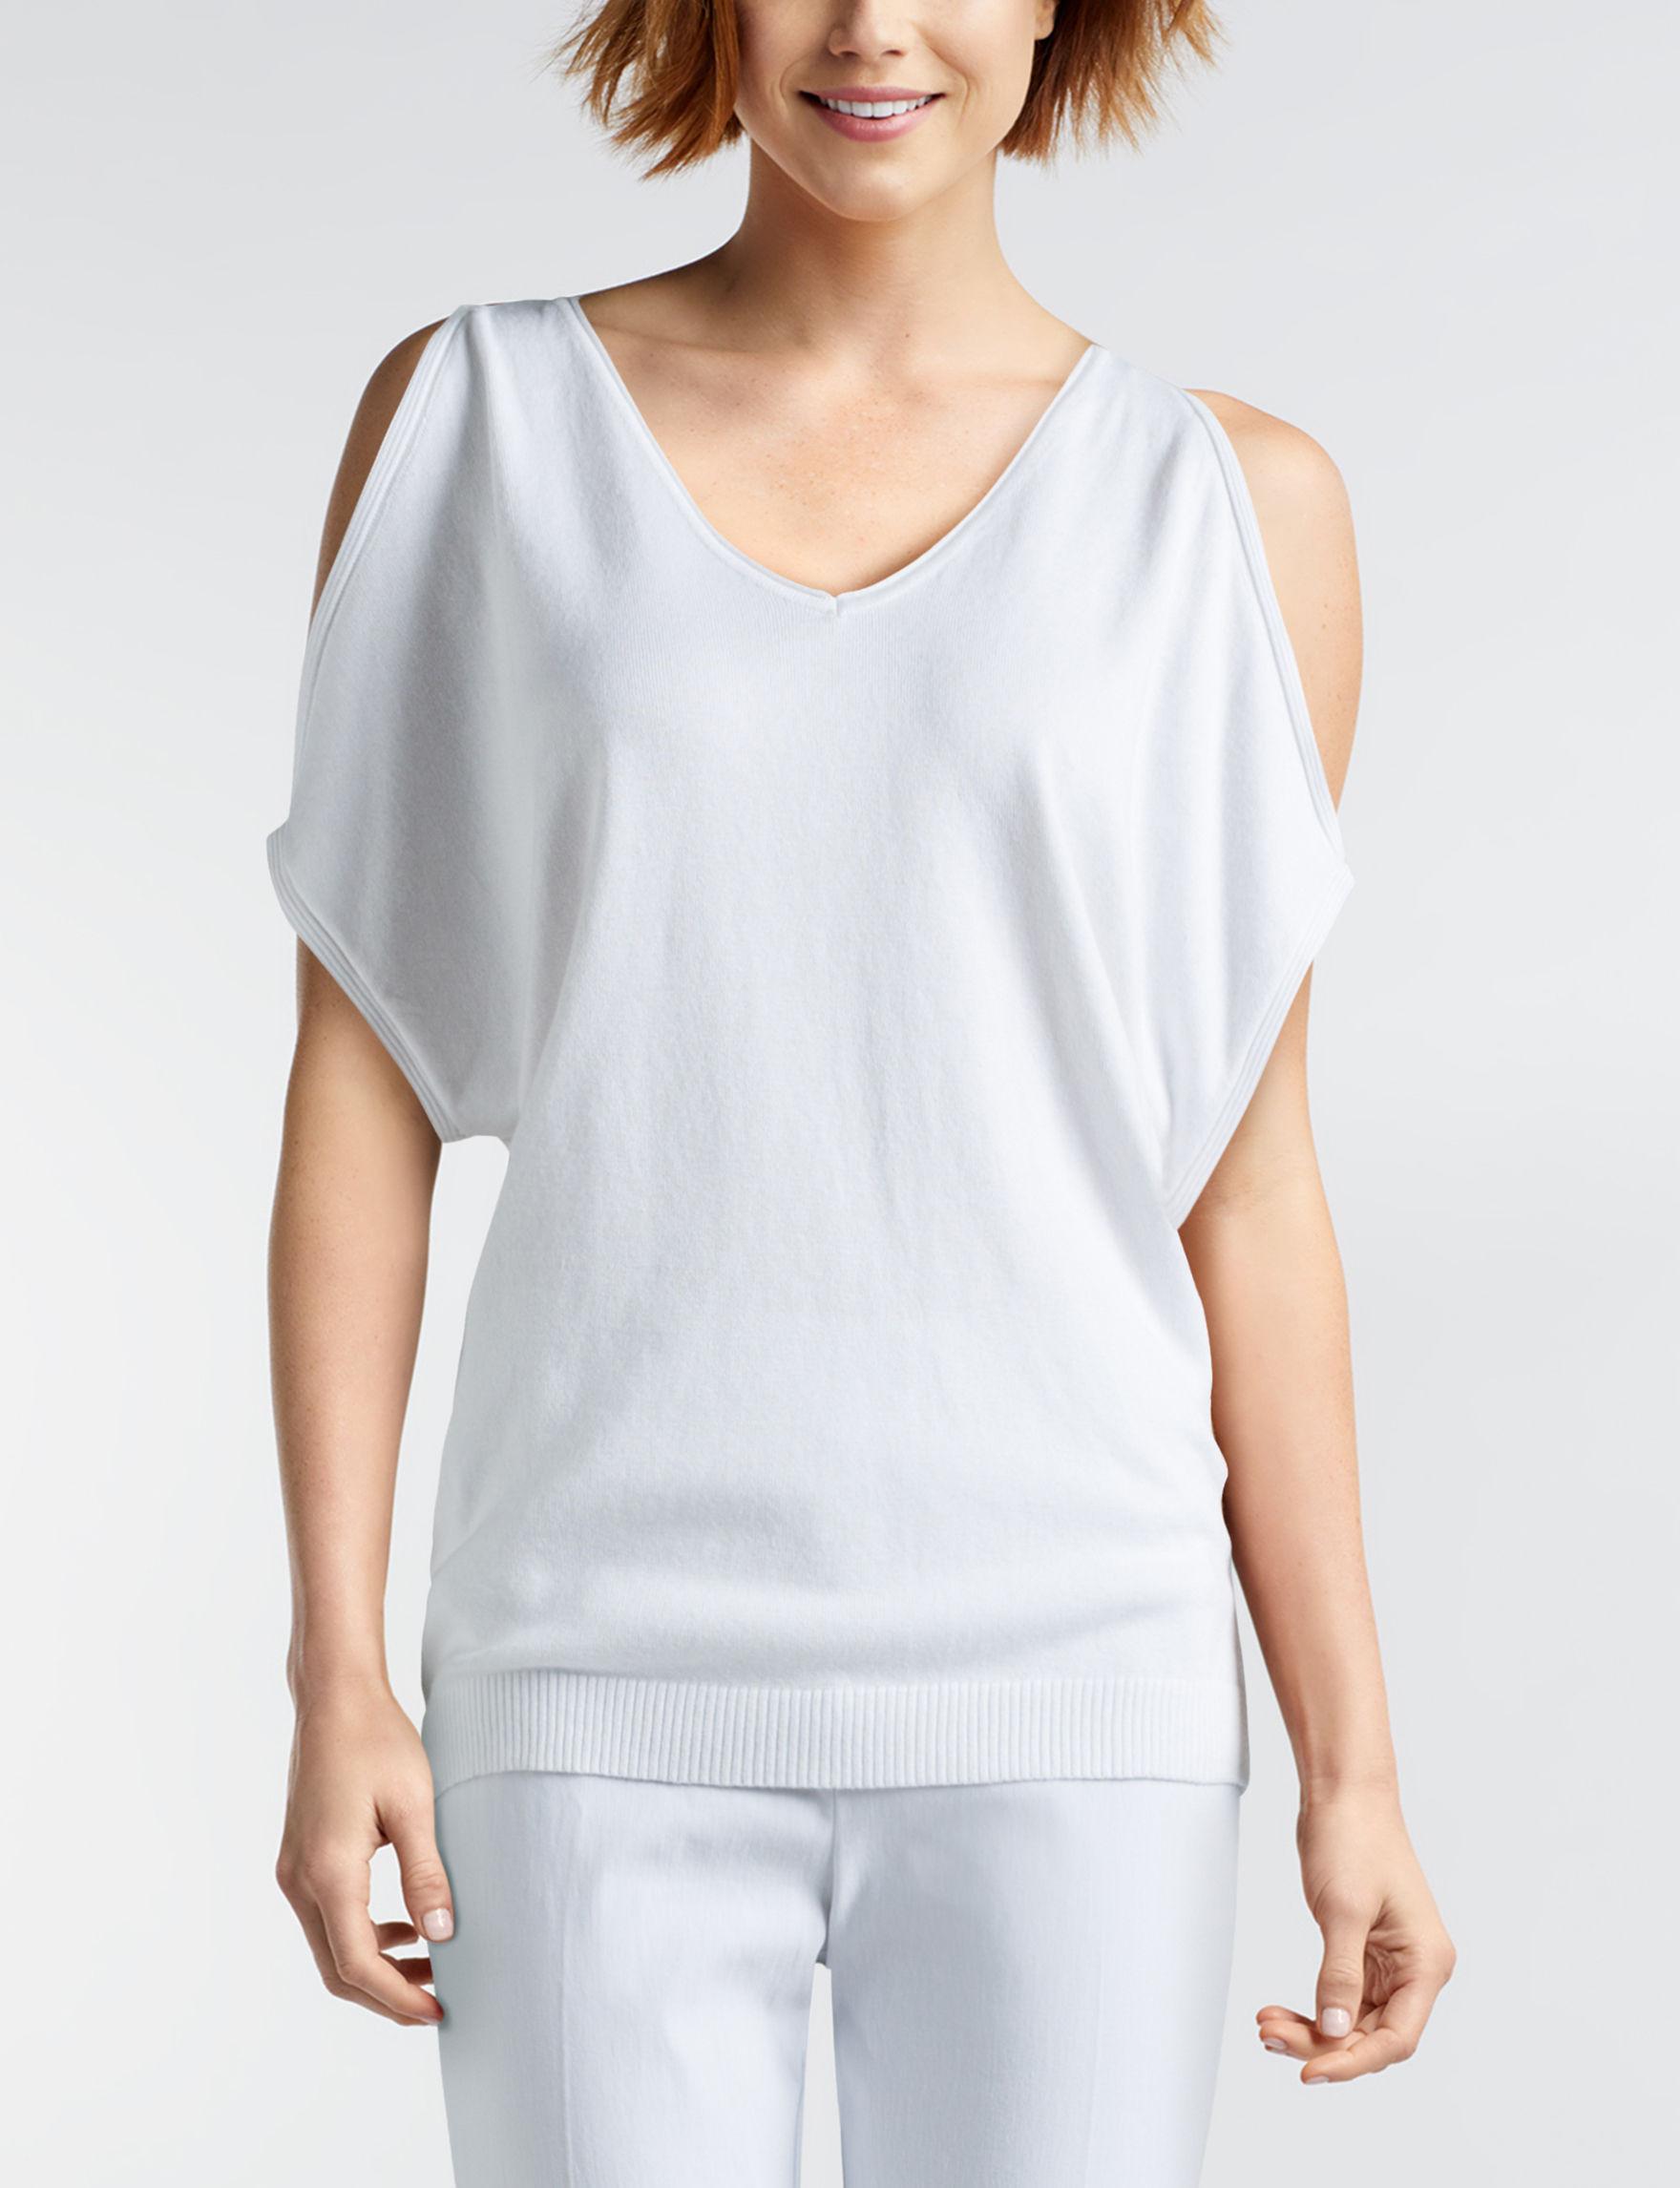 Joseph A White Shirts & Blouses